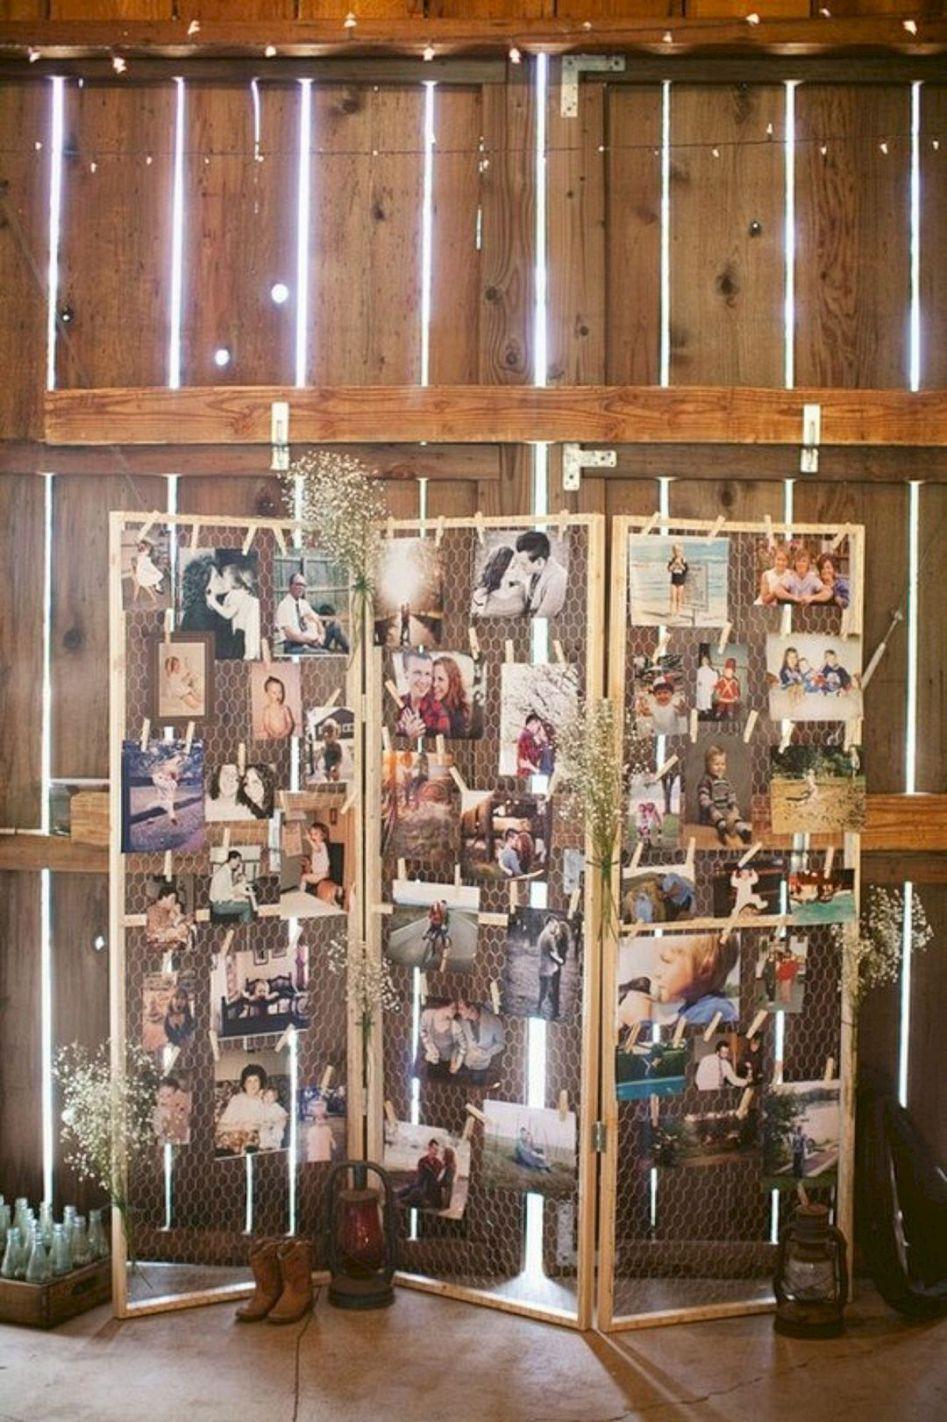 Wedding decoration ideas at church   Marvelous DIY Rustic u Cheap Wedding Centerpieces Ideas  Wedding